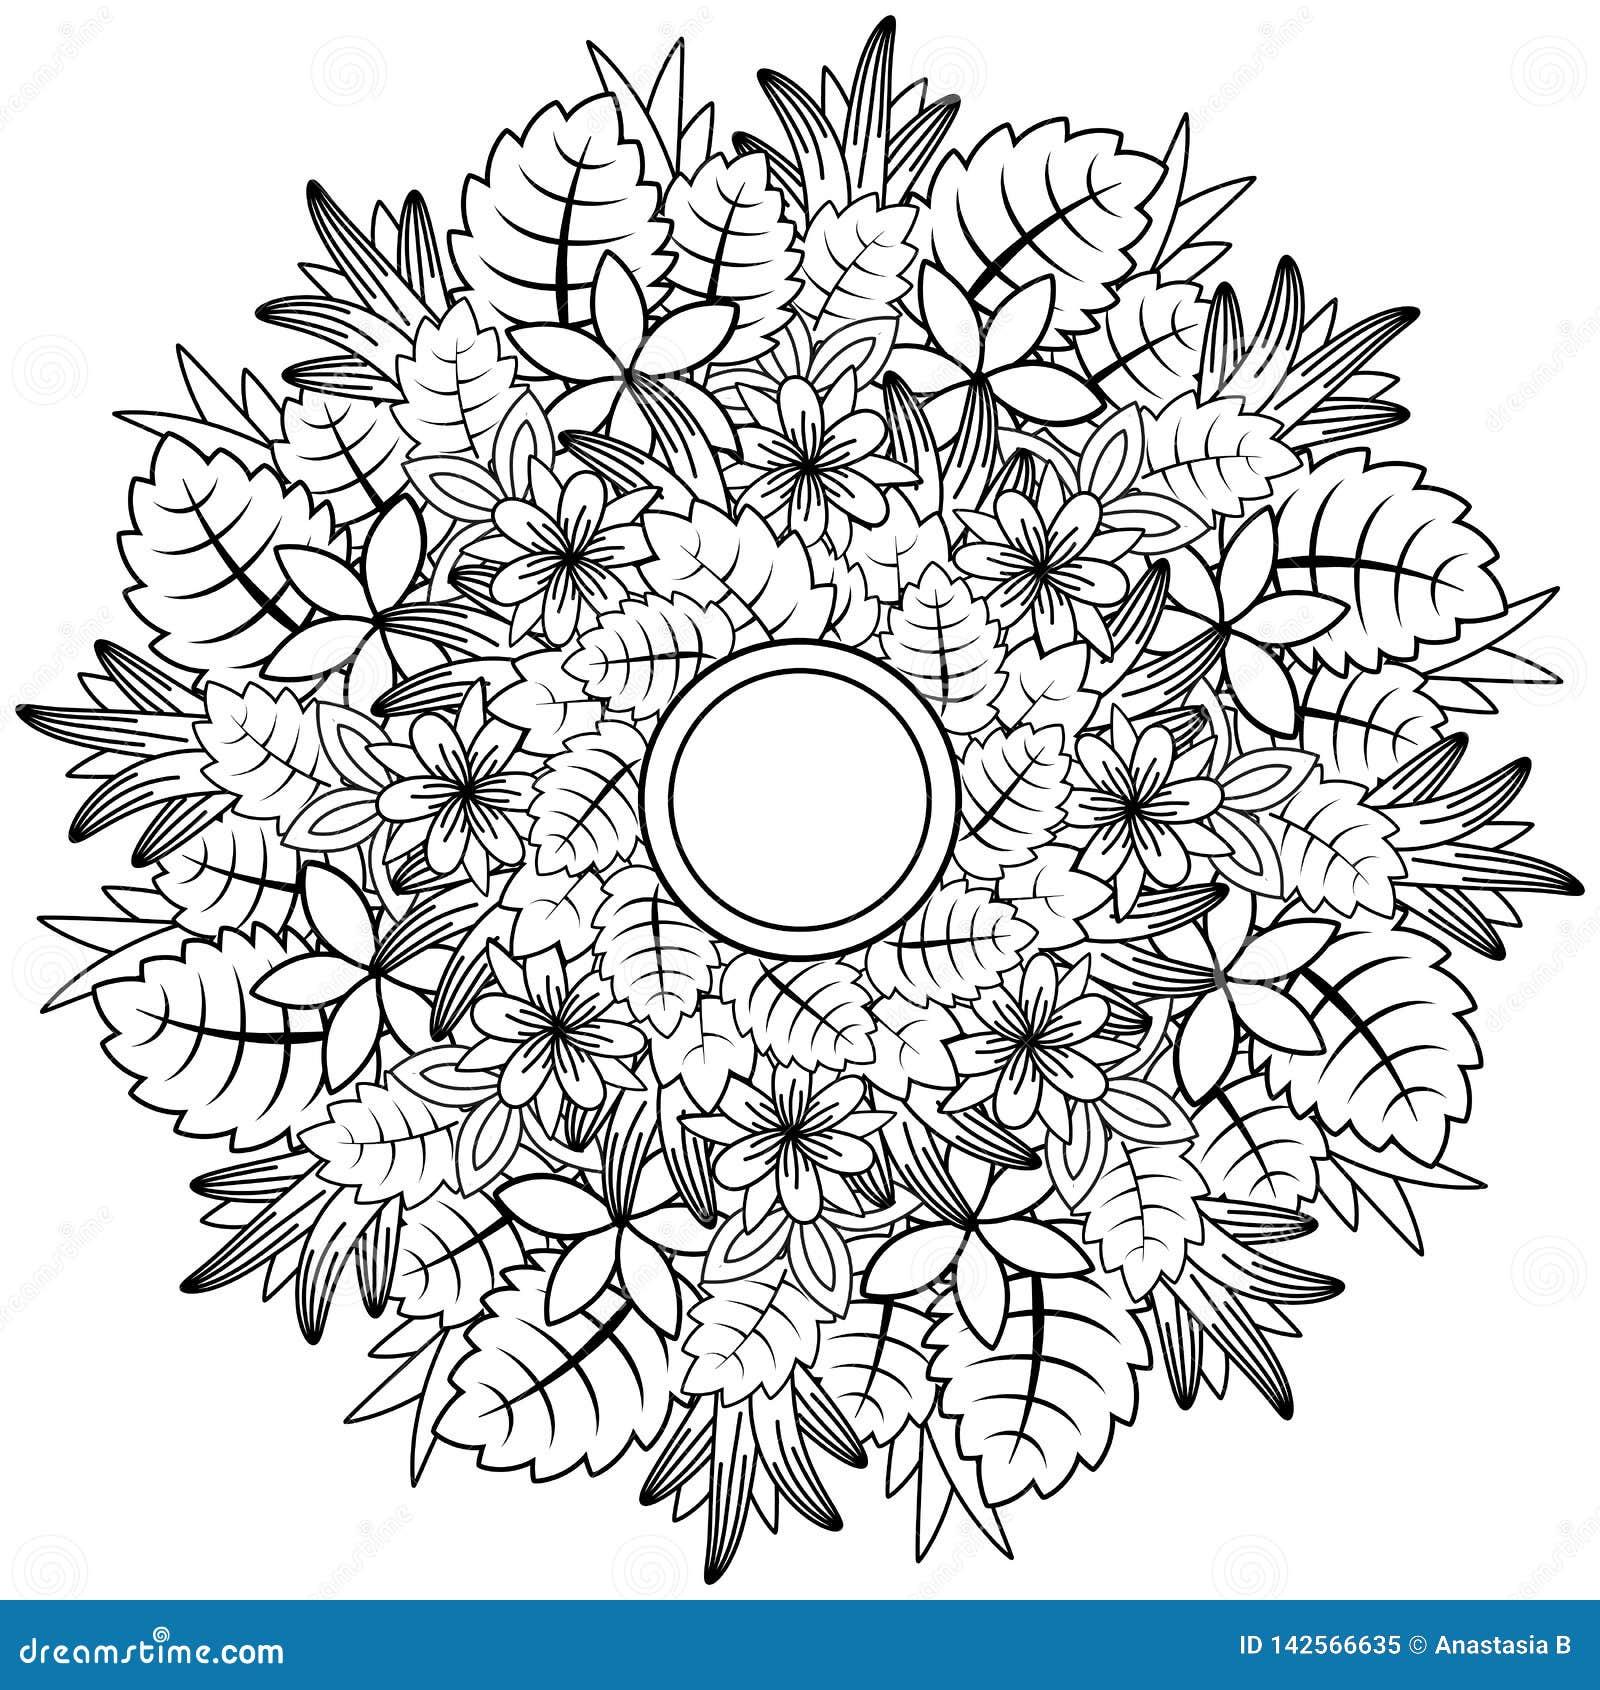 Floral mandala Διανυσματική απεικόνιση zentangl Σχέδιο Doodle Στοχαστικές ασκήσεις Αντι πίεση βιβλίων χρωματισμού